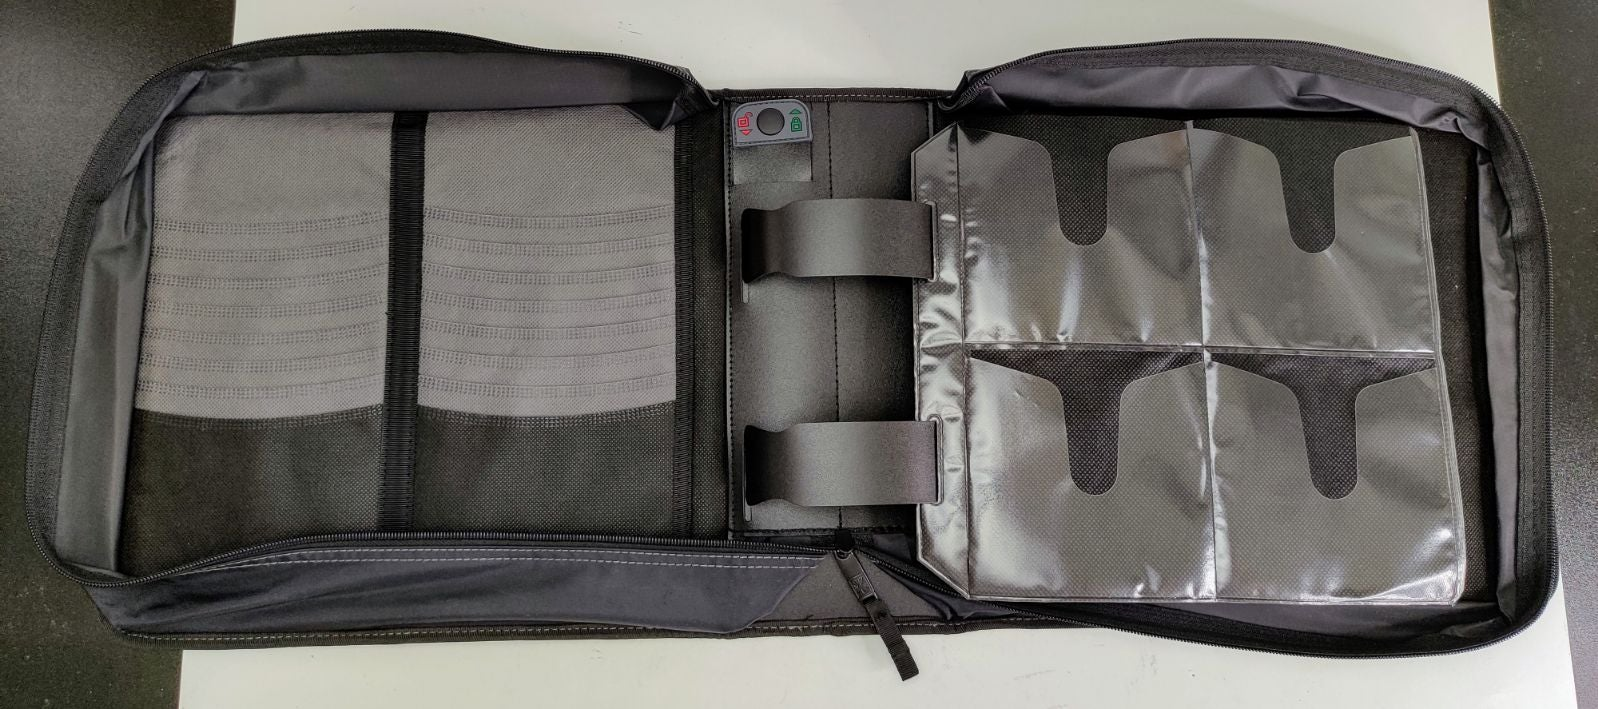 Case Logic CDW-208 Portable Case-Wallet